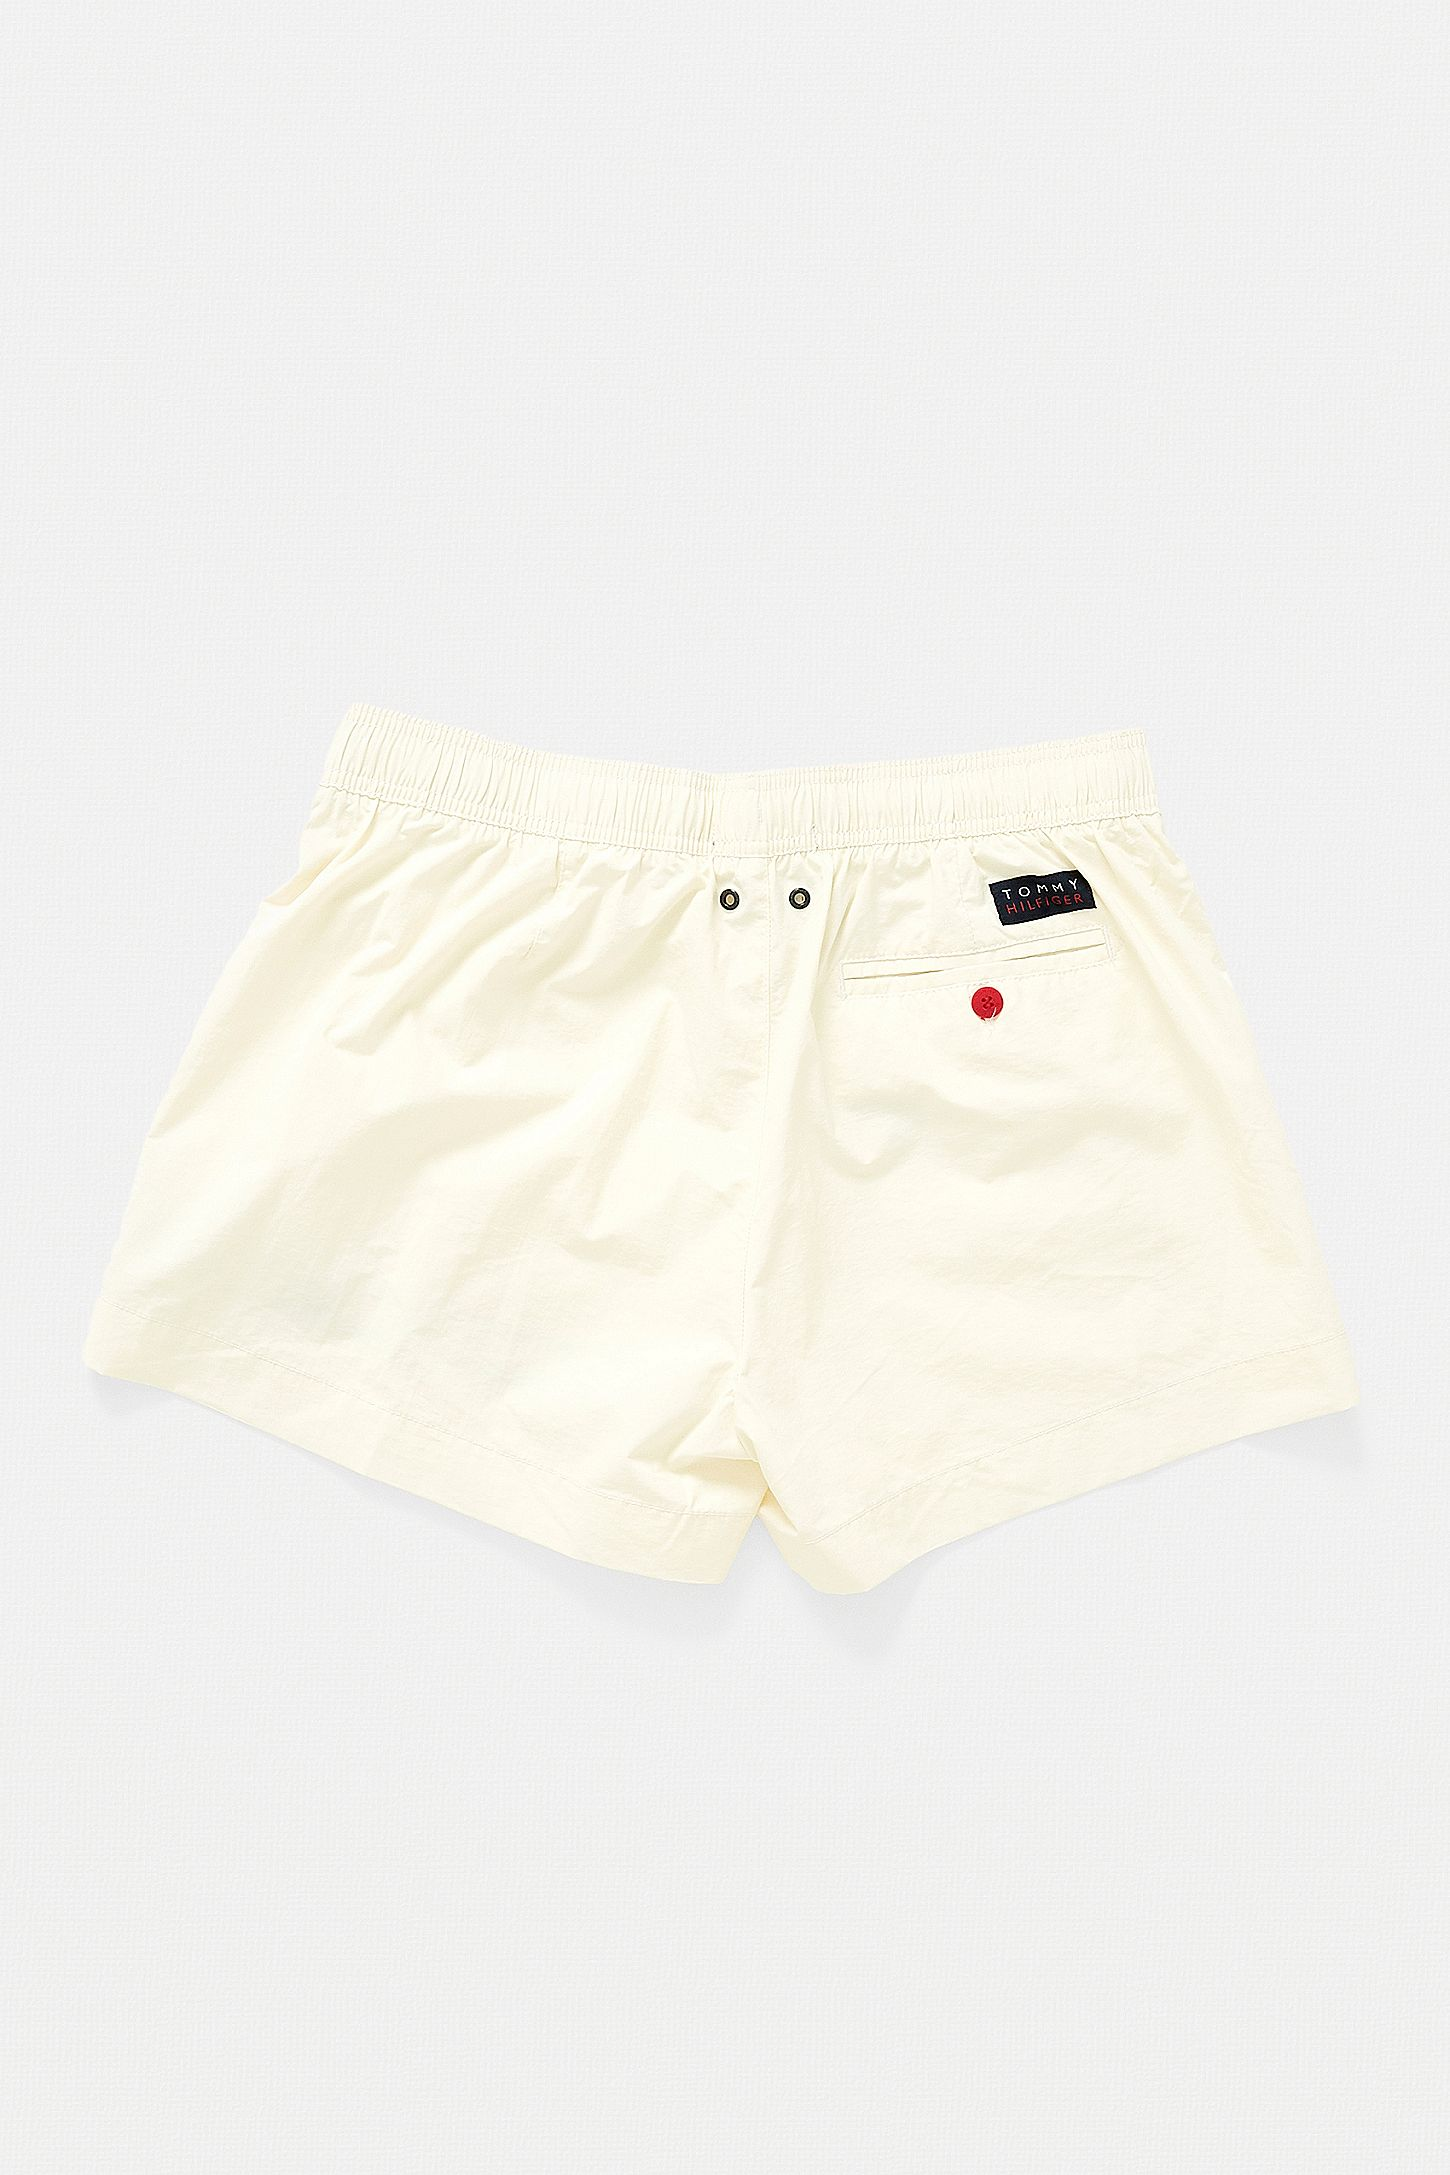 fec84fd12f Tommy Hilfiger Crest Logo White Swim Shorts | Urban Outfitters UK